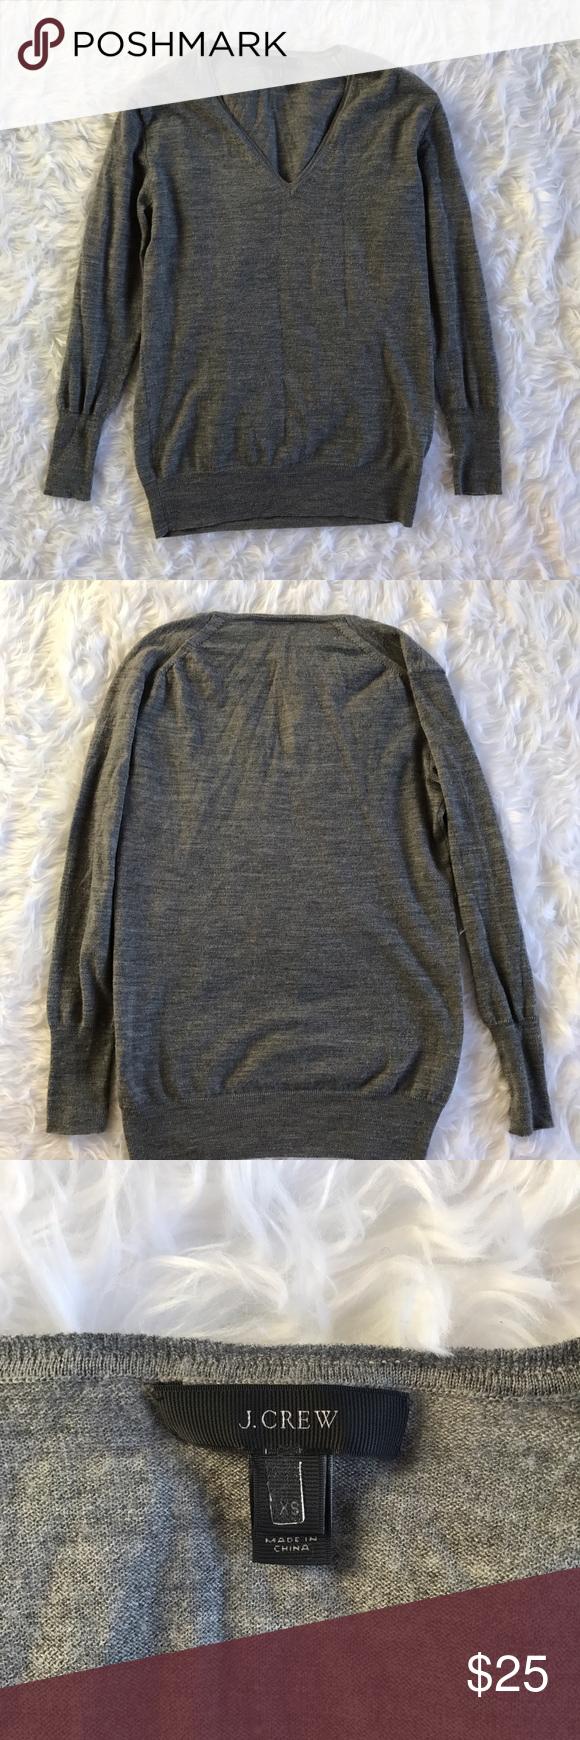 Jcrew vneck merino wool gray sweater Jcrew 100% merino wool gray sweater in good condition. No flaws. Great vneck light but warm sweater. Size XS J. Crew Sweaters V-Necks